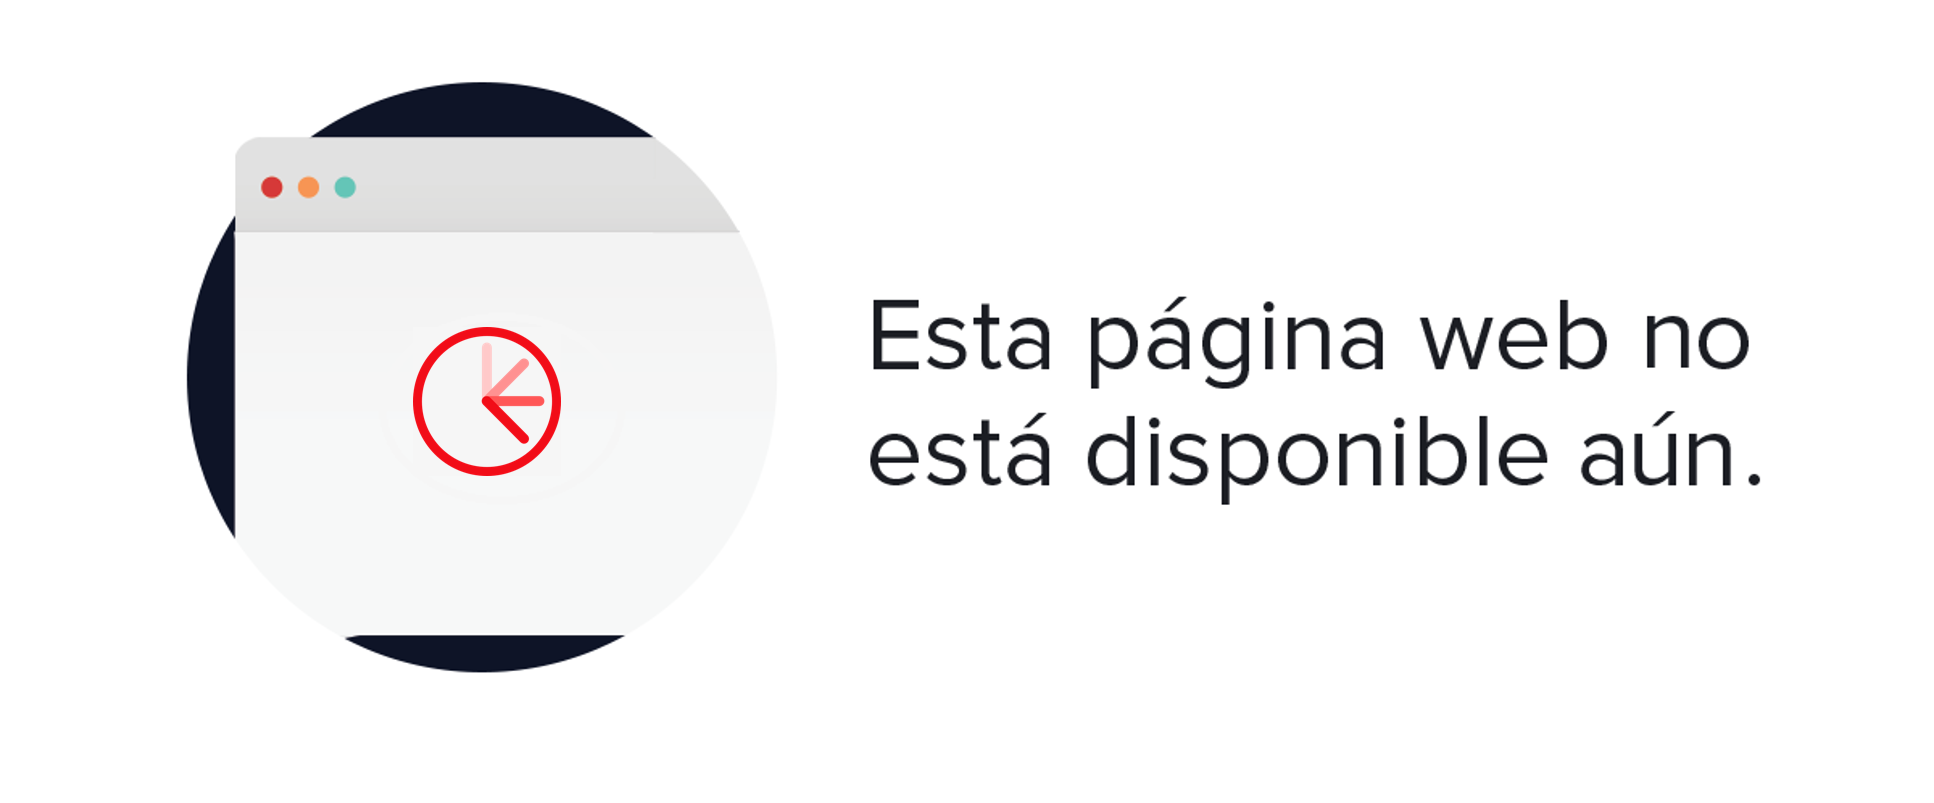 promo code 78a9a 3d0fe adidas superstar 2 farbe dots mujer blanco negro rojo ESj29jl Córdoba Compra